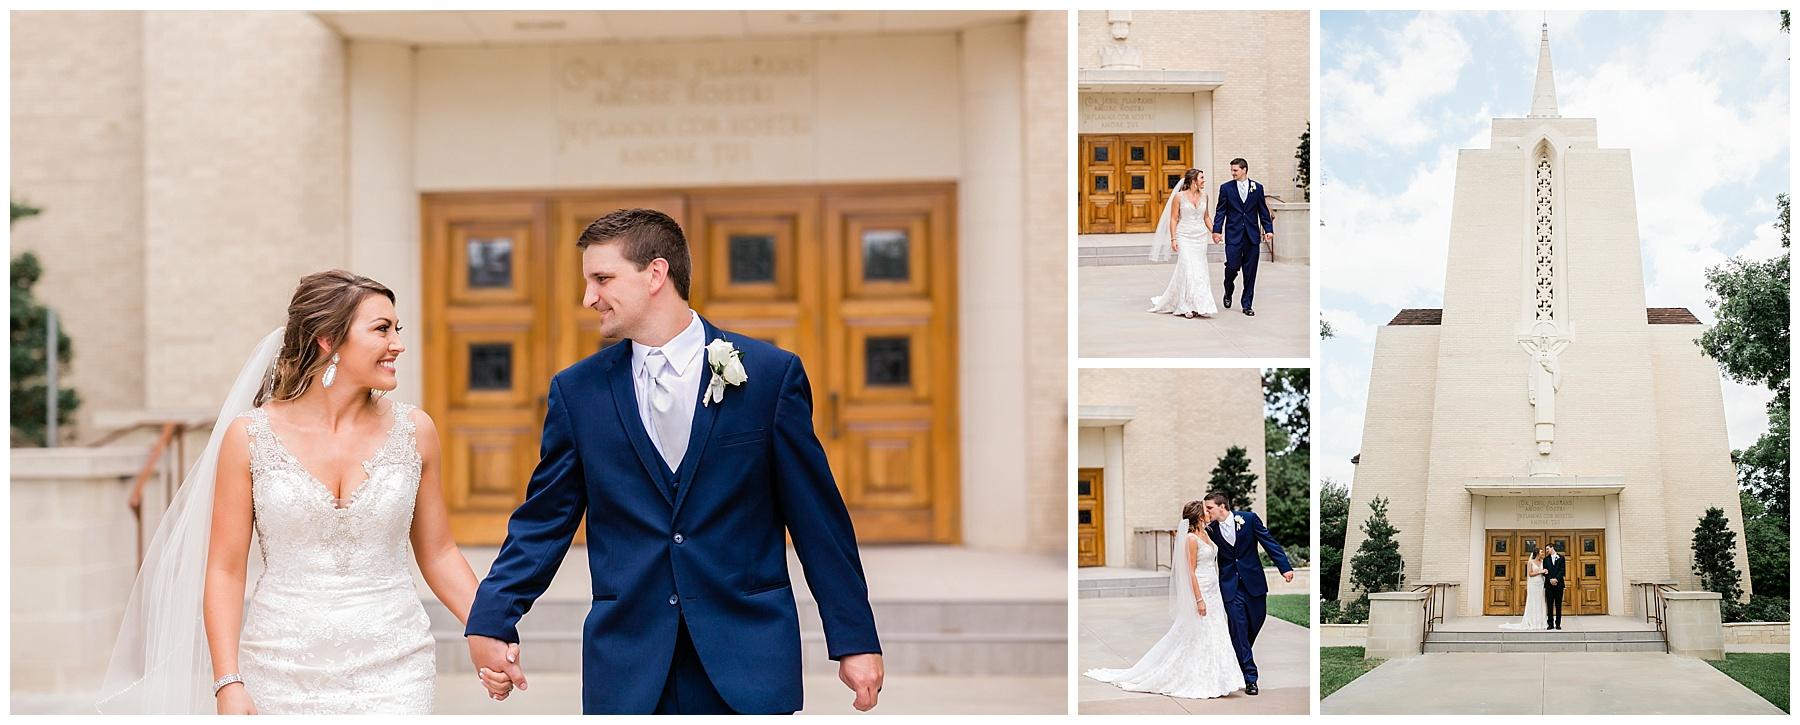 sacred-heart-catholic-church-muenster-tx-the-veranda-in-nocona-tx-wichita-falls-wedding-photographer-00033.jpg